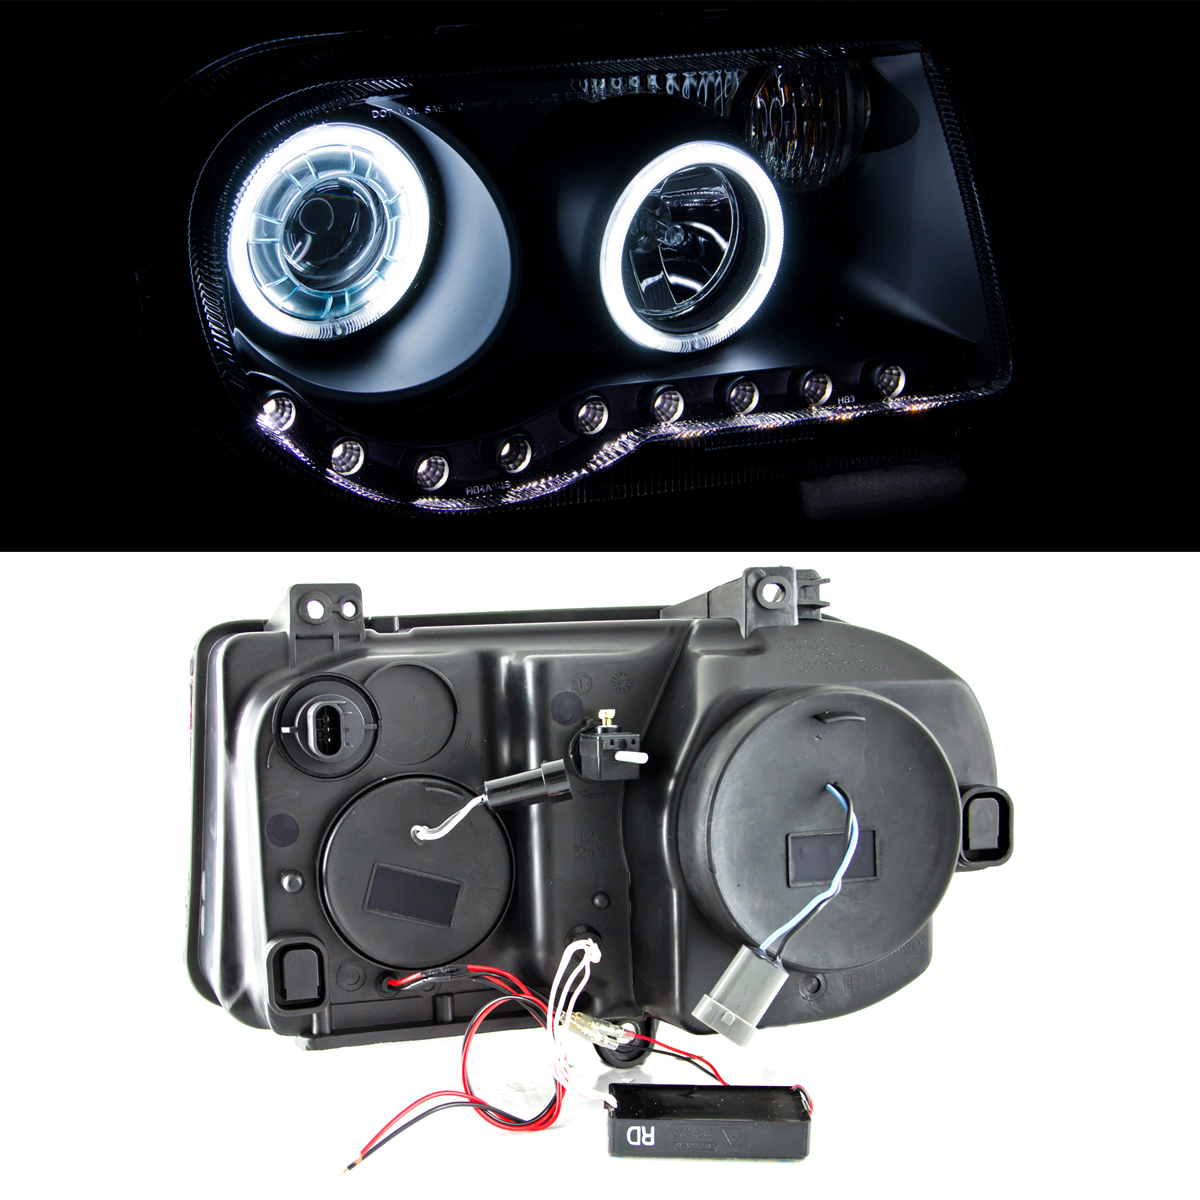 2005 2006 2007 Chrysler 300c Srt8 Clear Black Headlights: [Dual CCFL Halo] 2005 2006 2007 2008 2009 2010 Chrysler